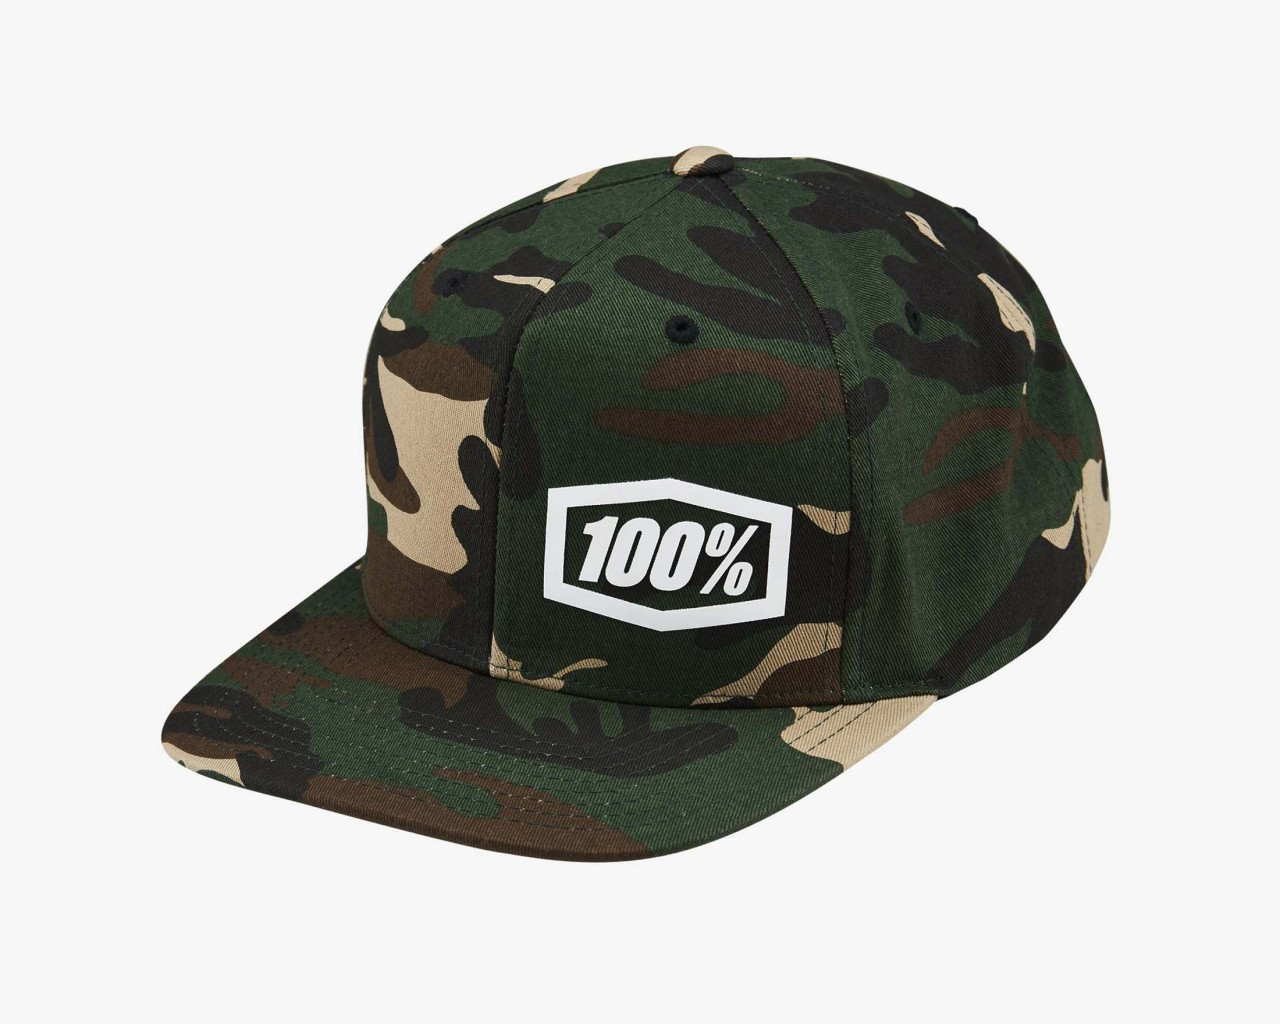 100% Machine 2019 Snapback Hat | camo black-green